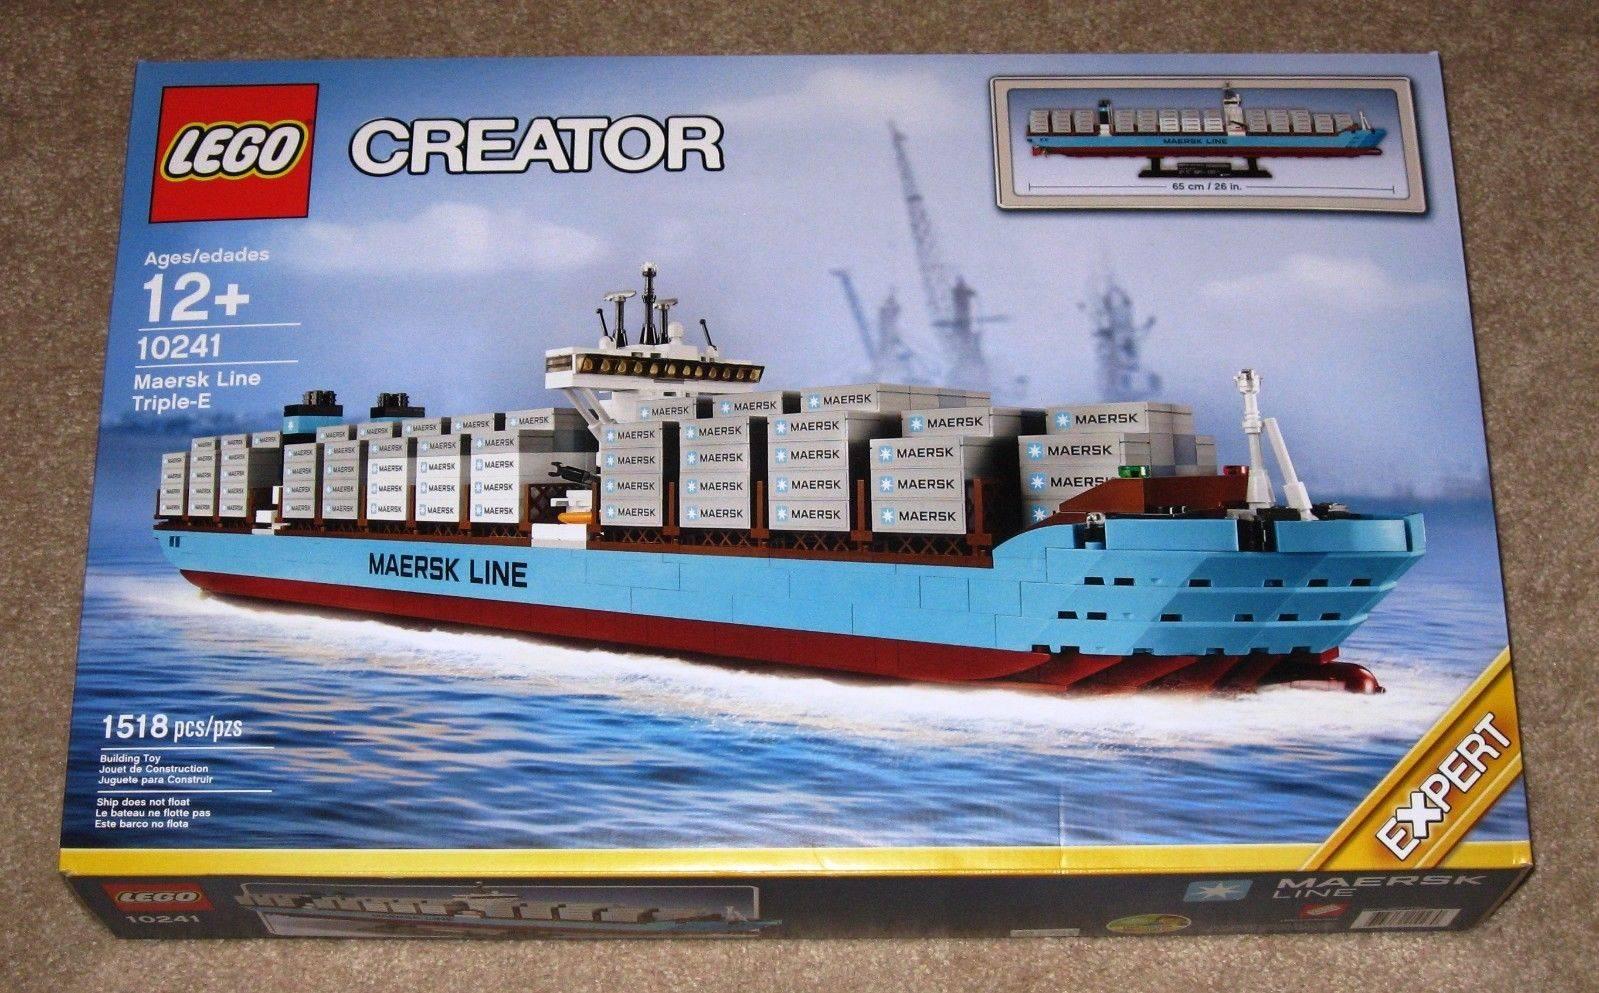 Lego 10241 Creator Maersk Line Triple-E Set